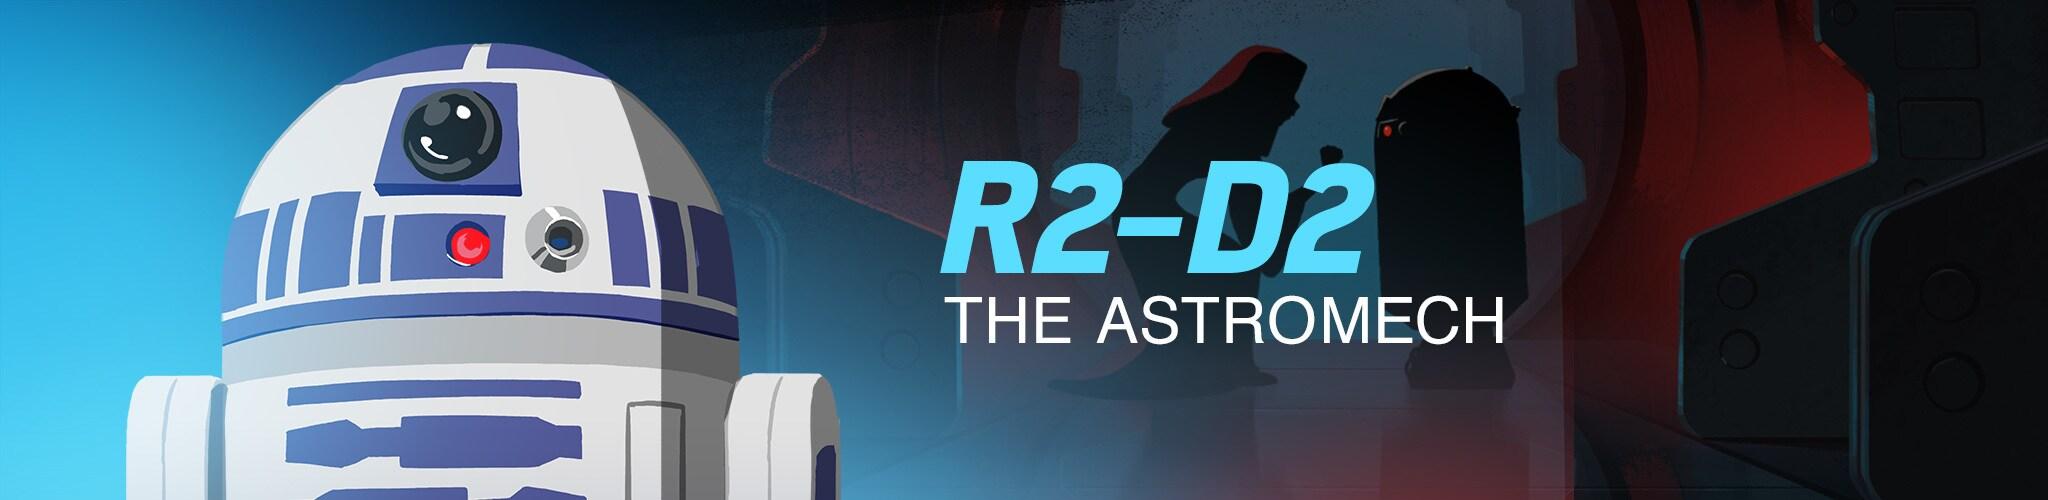 R2-D2 - The Astromech